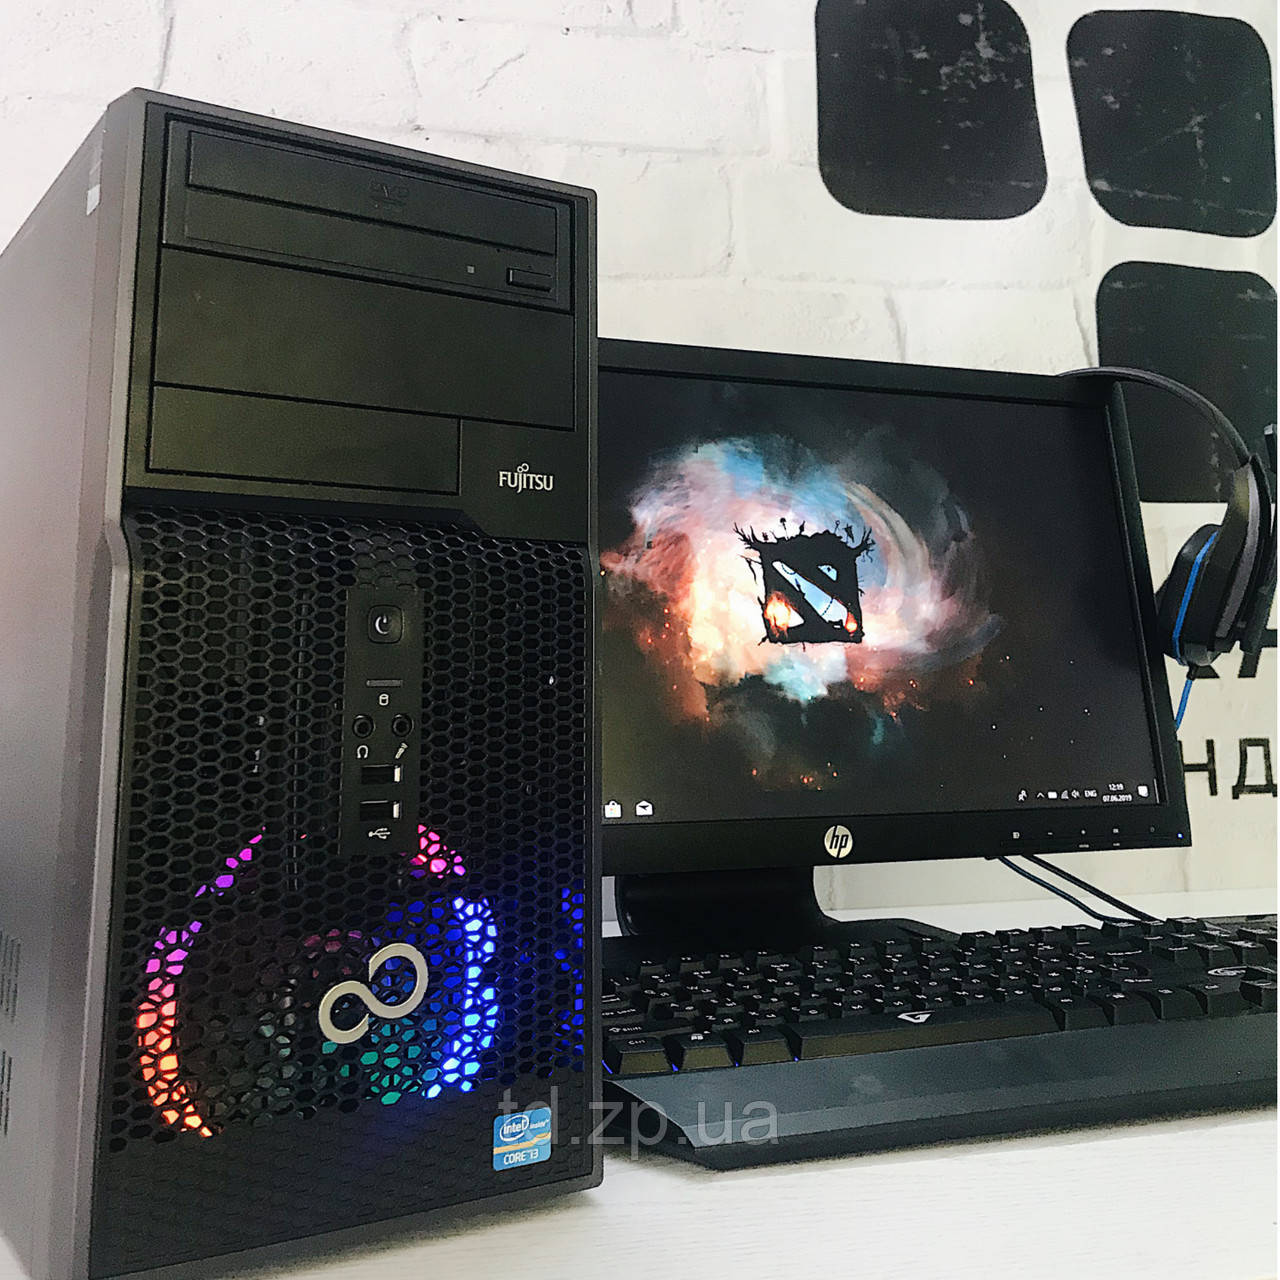 Игровой компьютер Intel Core i5-2310 + NVIDIA GTX 950 2Gb + RAM 8Gb + SSD 120Gb + HDD 500Gb